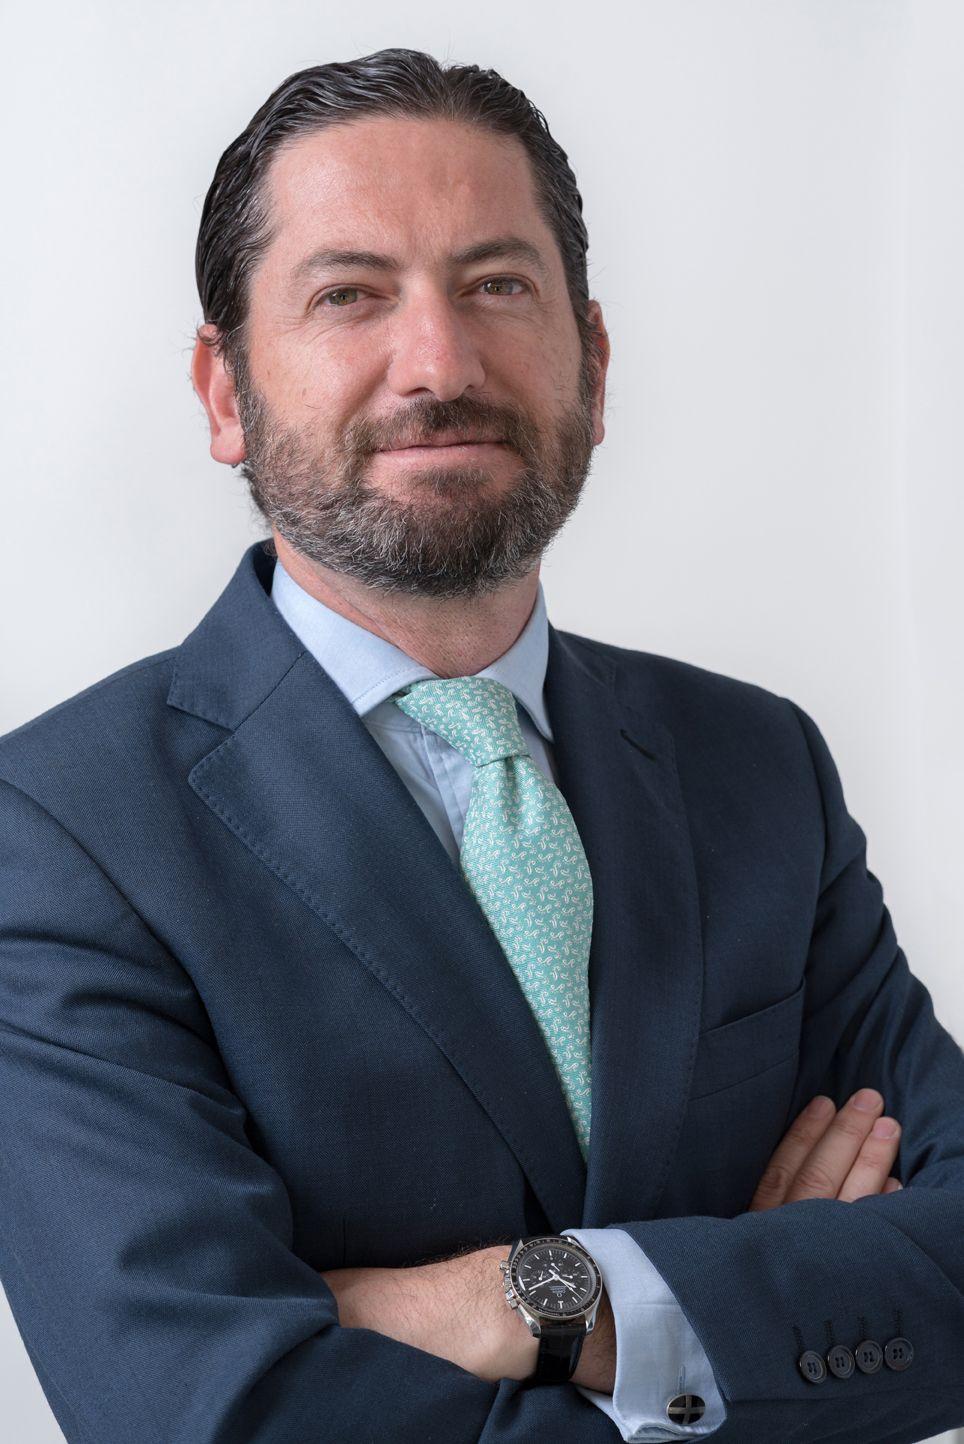 Luis Alviz